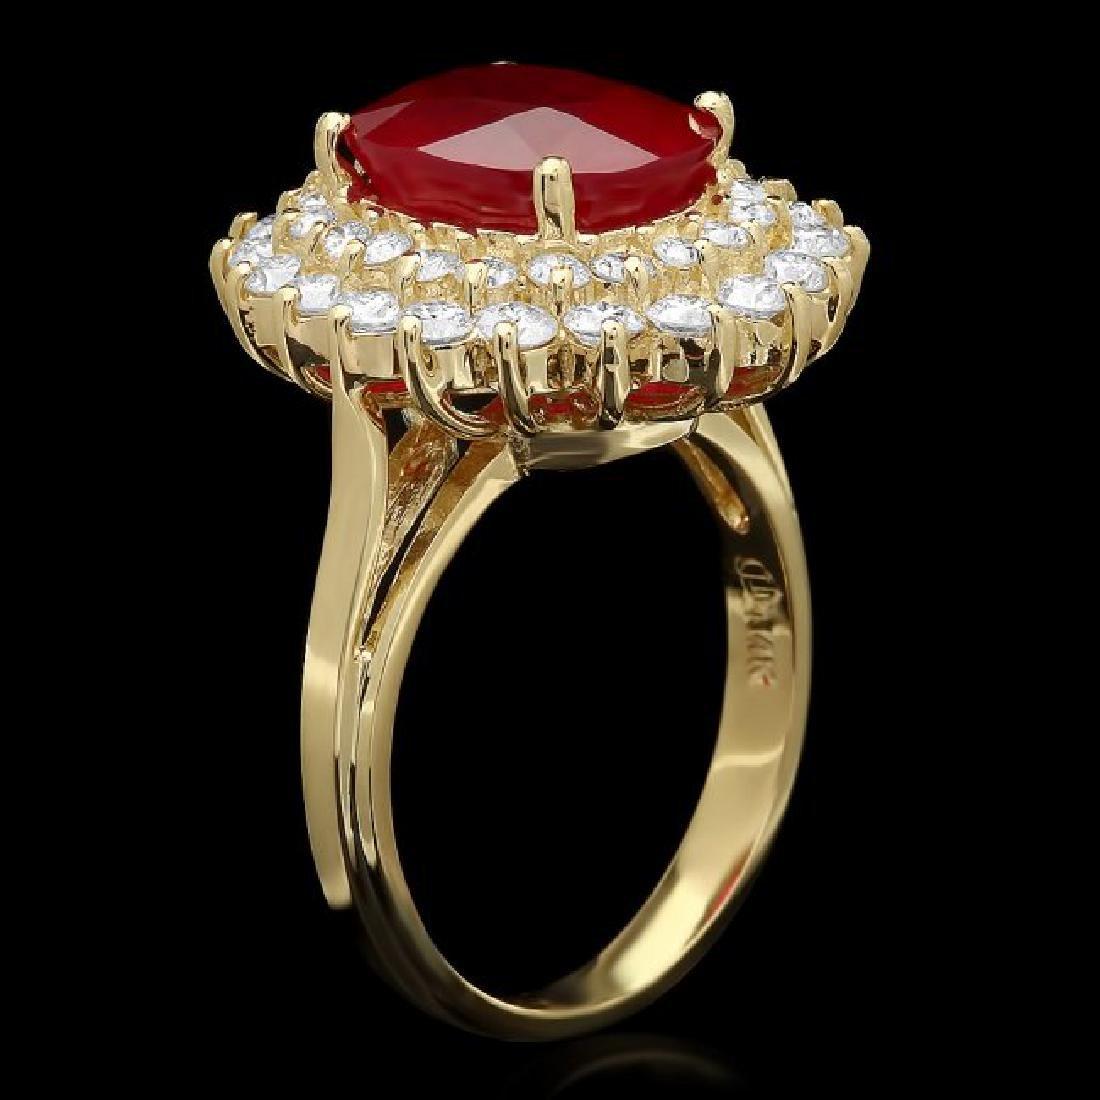 14k Yellow Gold 5.60ct Ruby 1.60ct Diamond Ring - 2